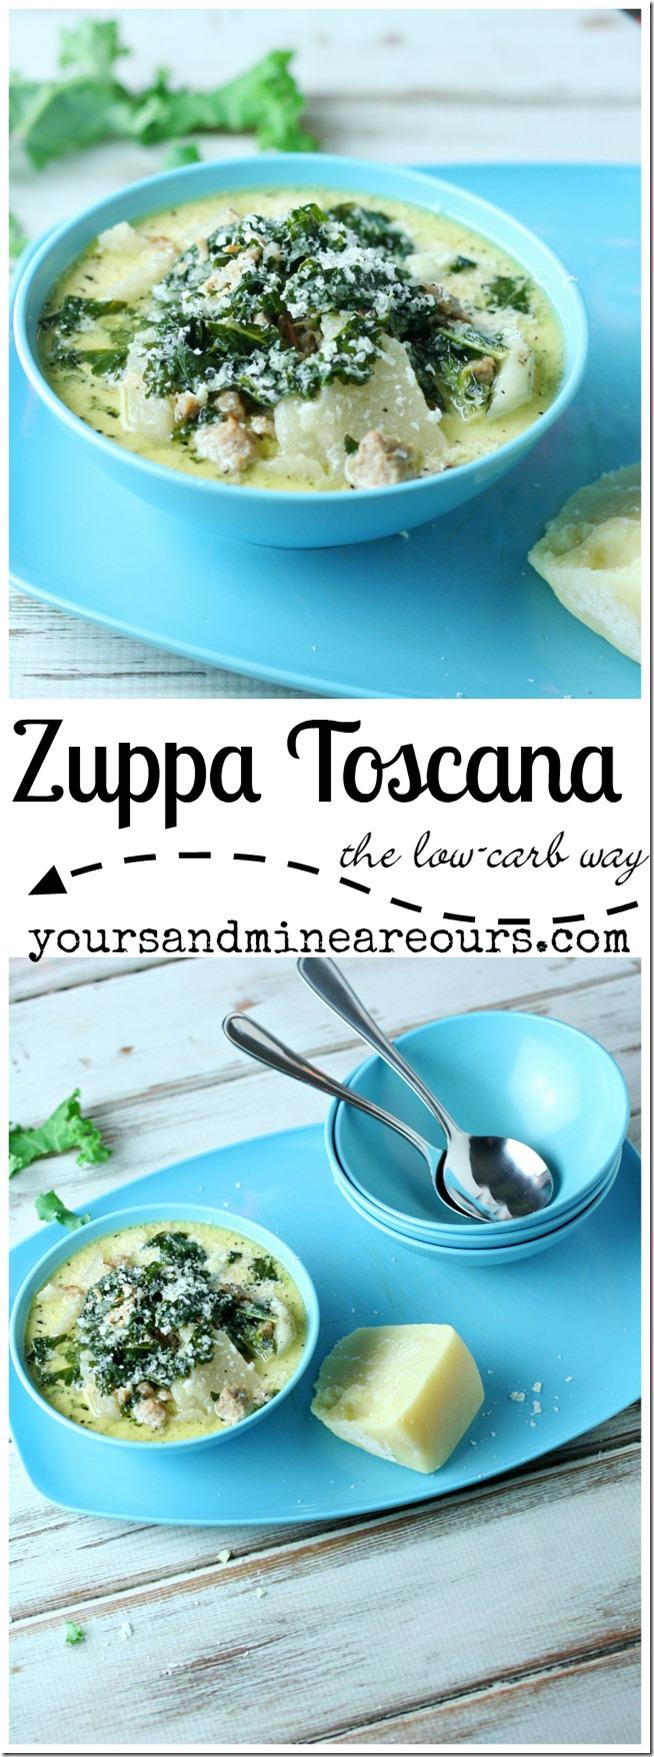 Zuppa Toscana The Low-Carb Way | YoursAndMineAreOurs.com